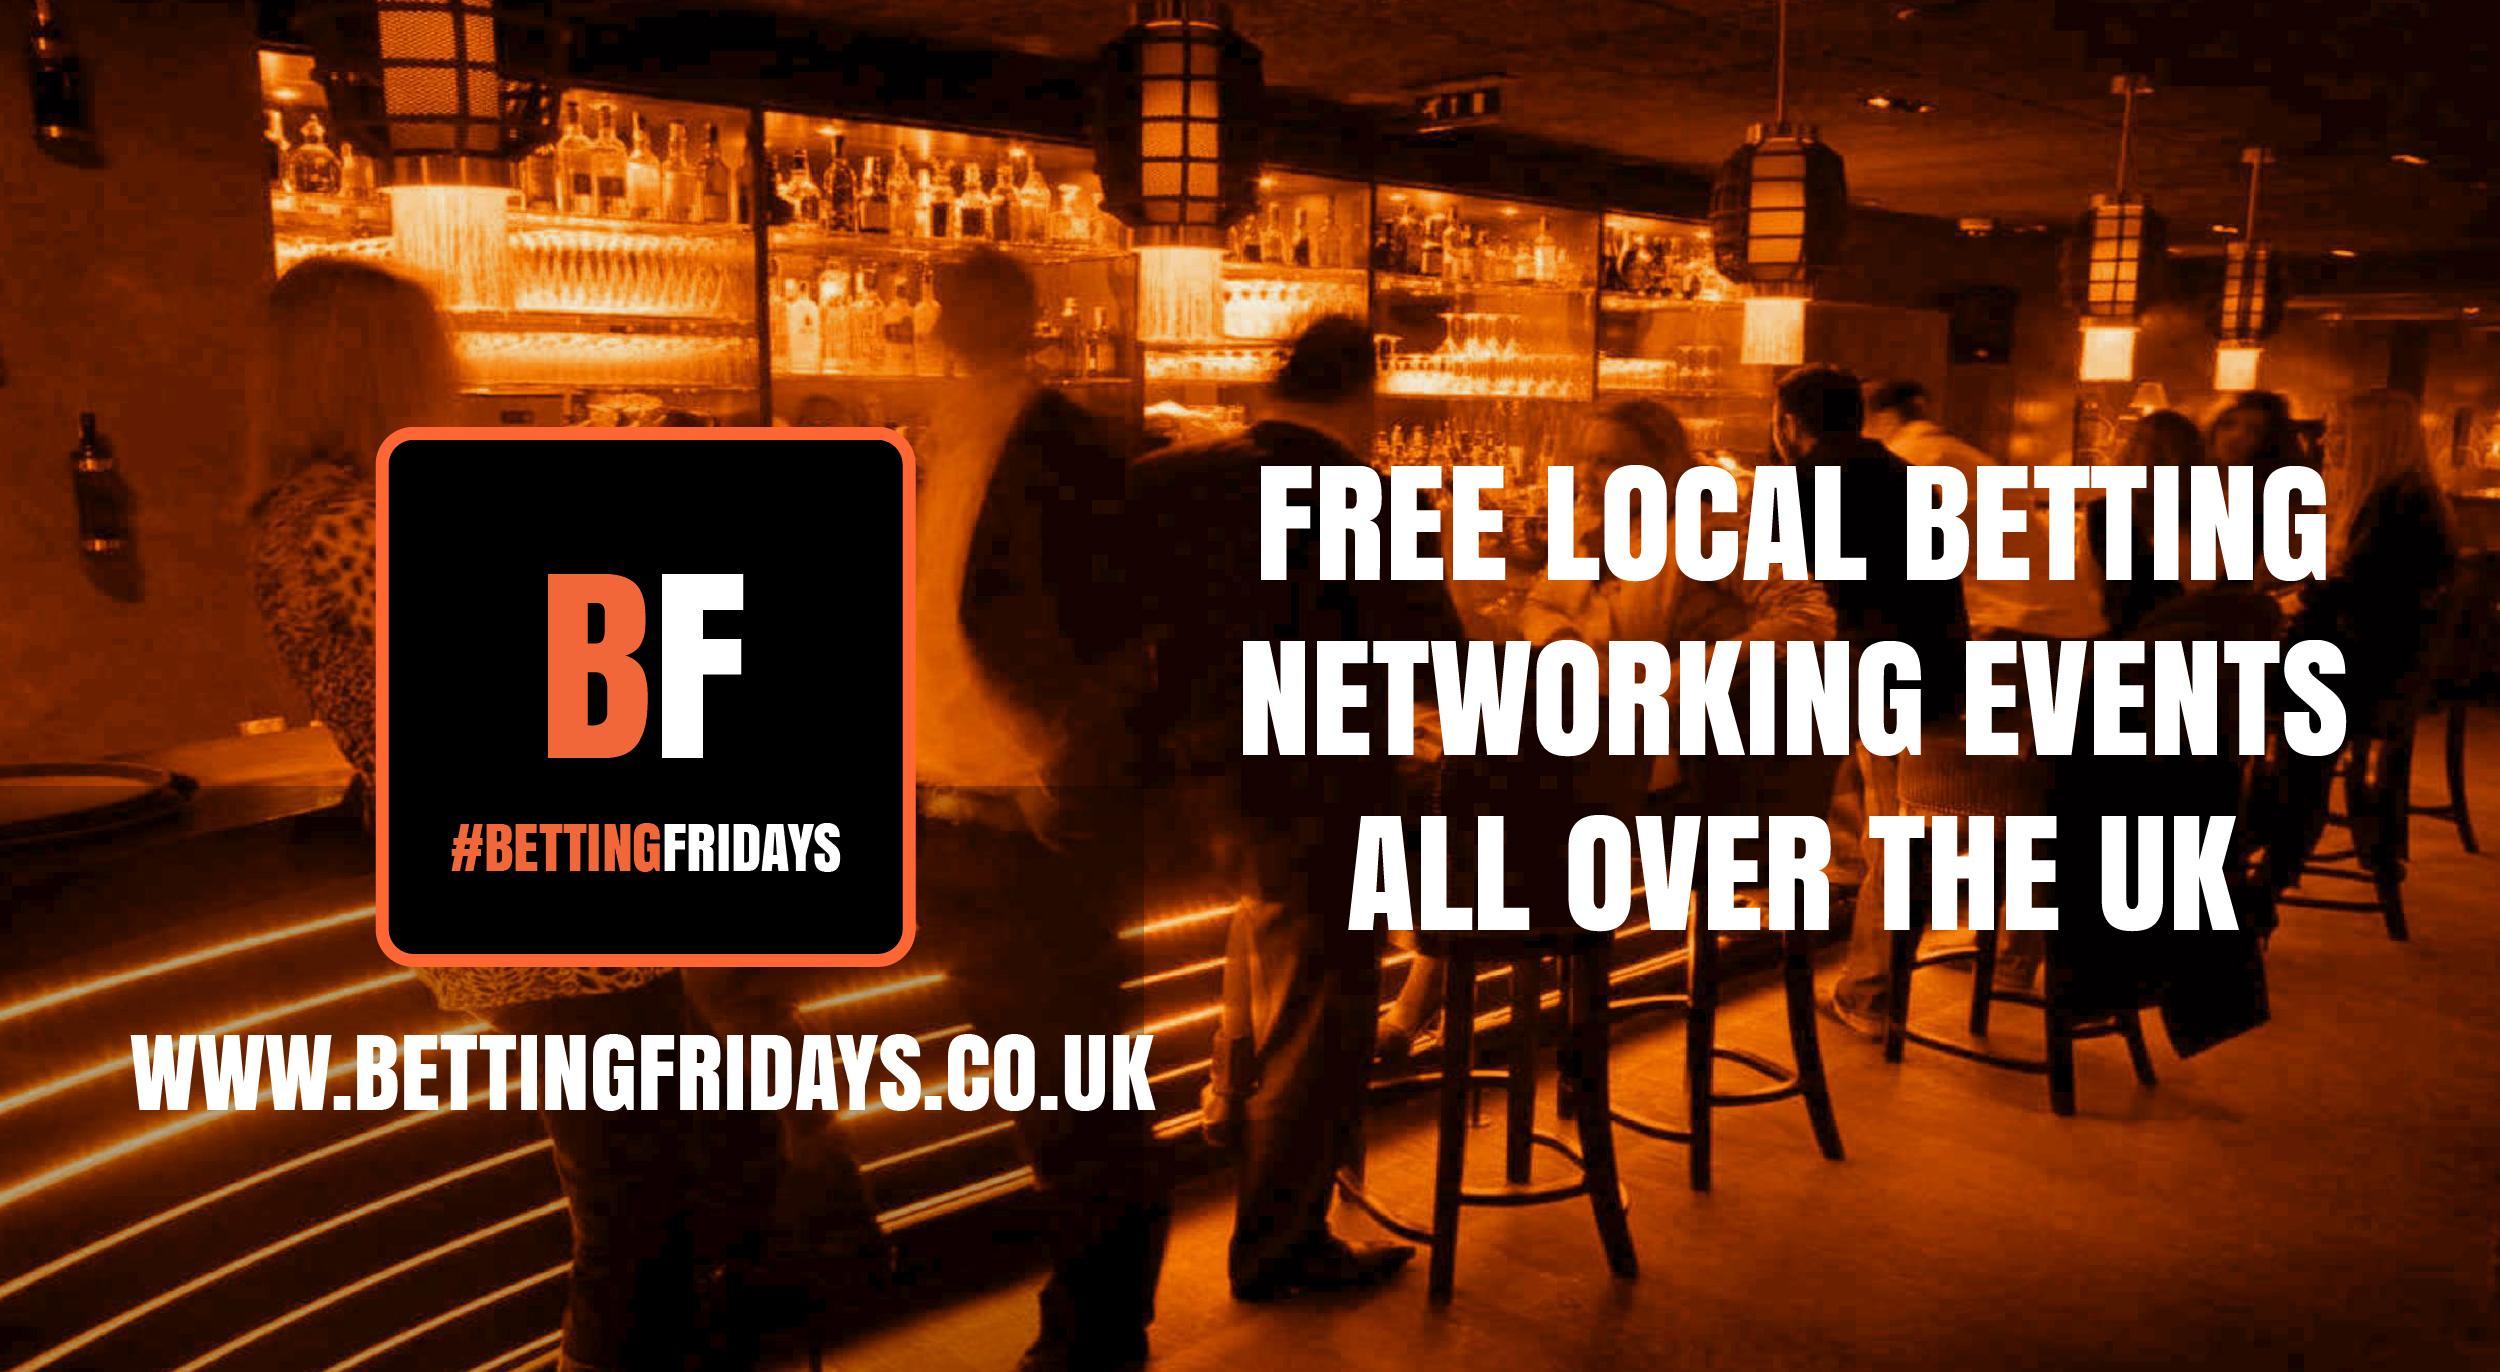 Betting Fridays! Free betting networking event in Edinburgh